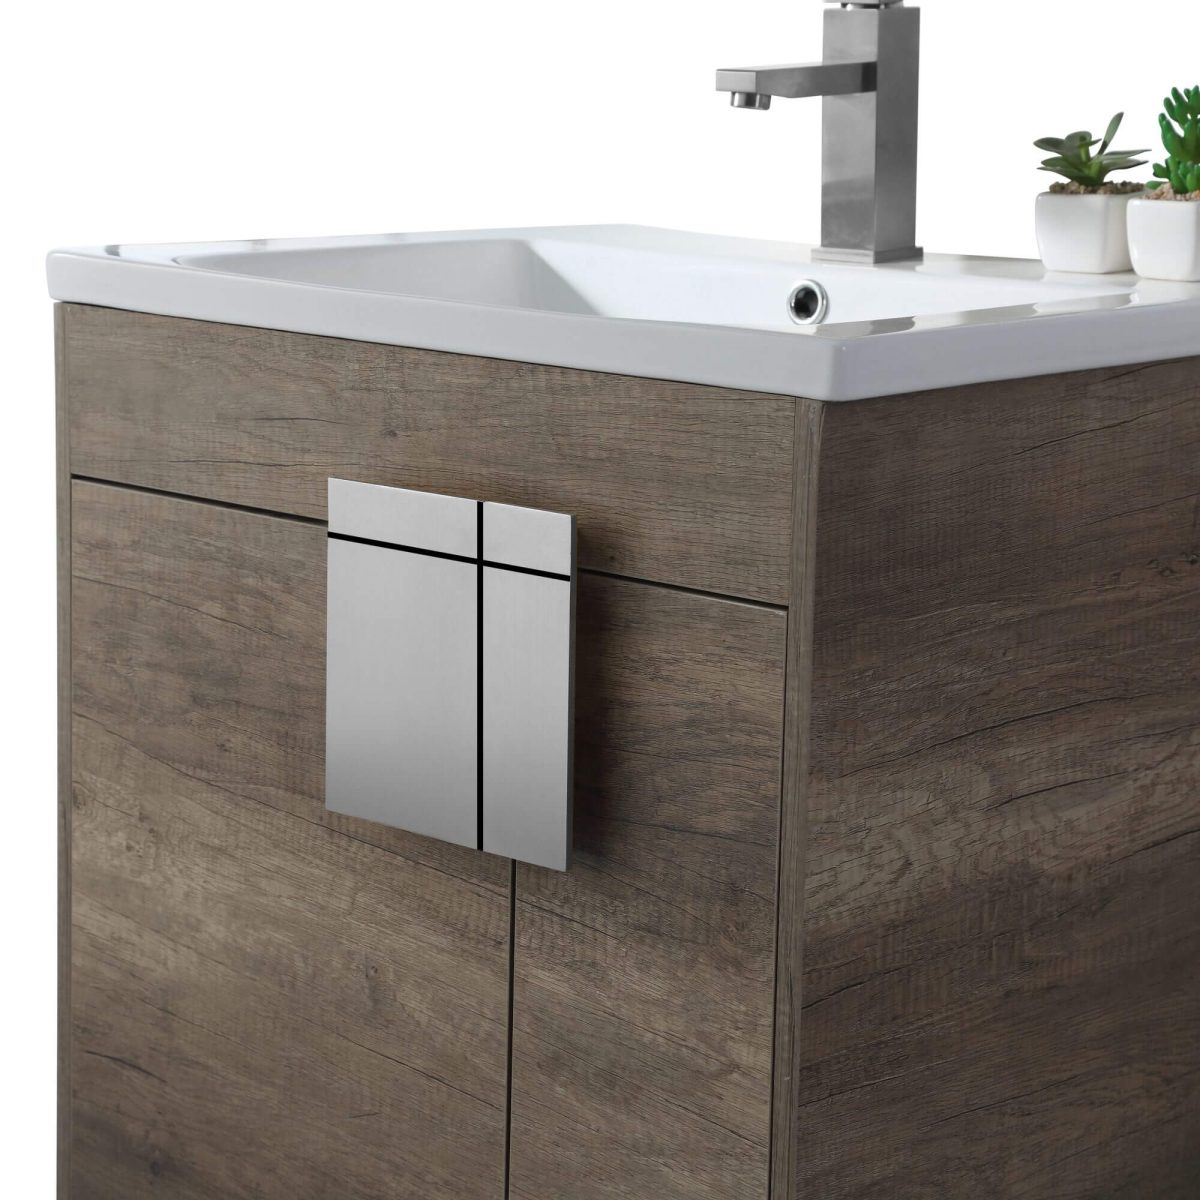 "Shawbridge 24"" Modern Bathroom Vanity  Shadow Gray with Polished Chrome Hardware"